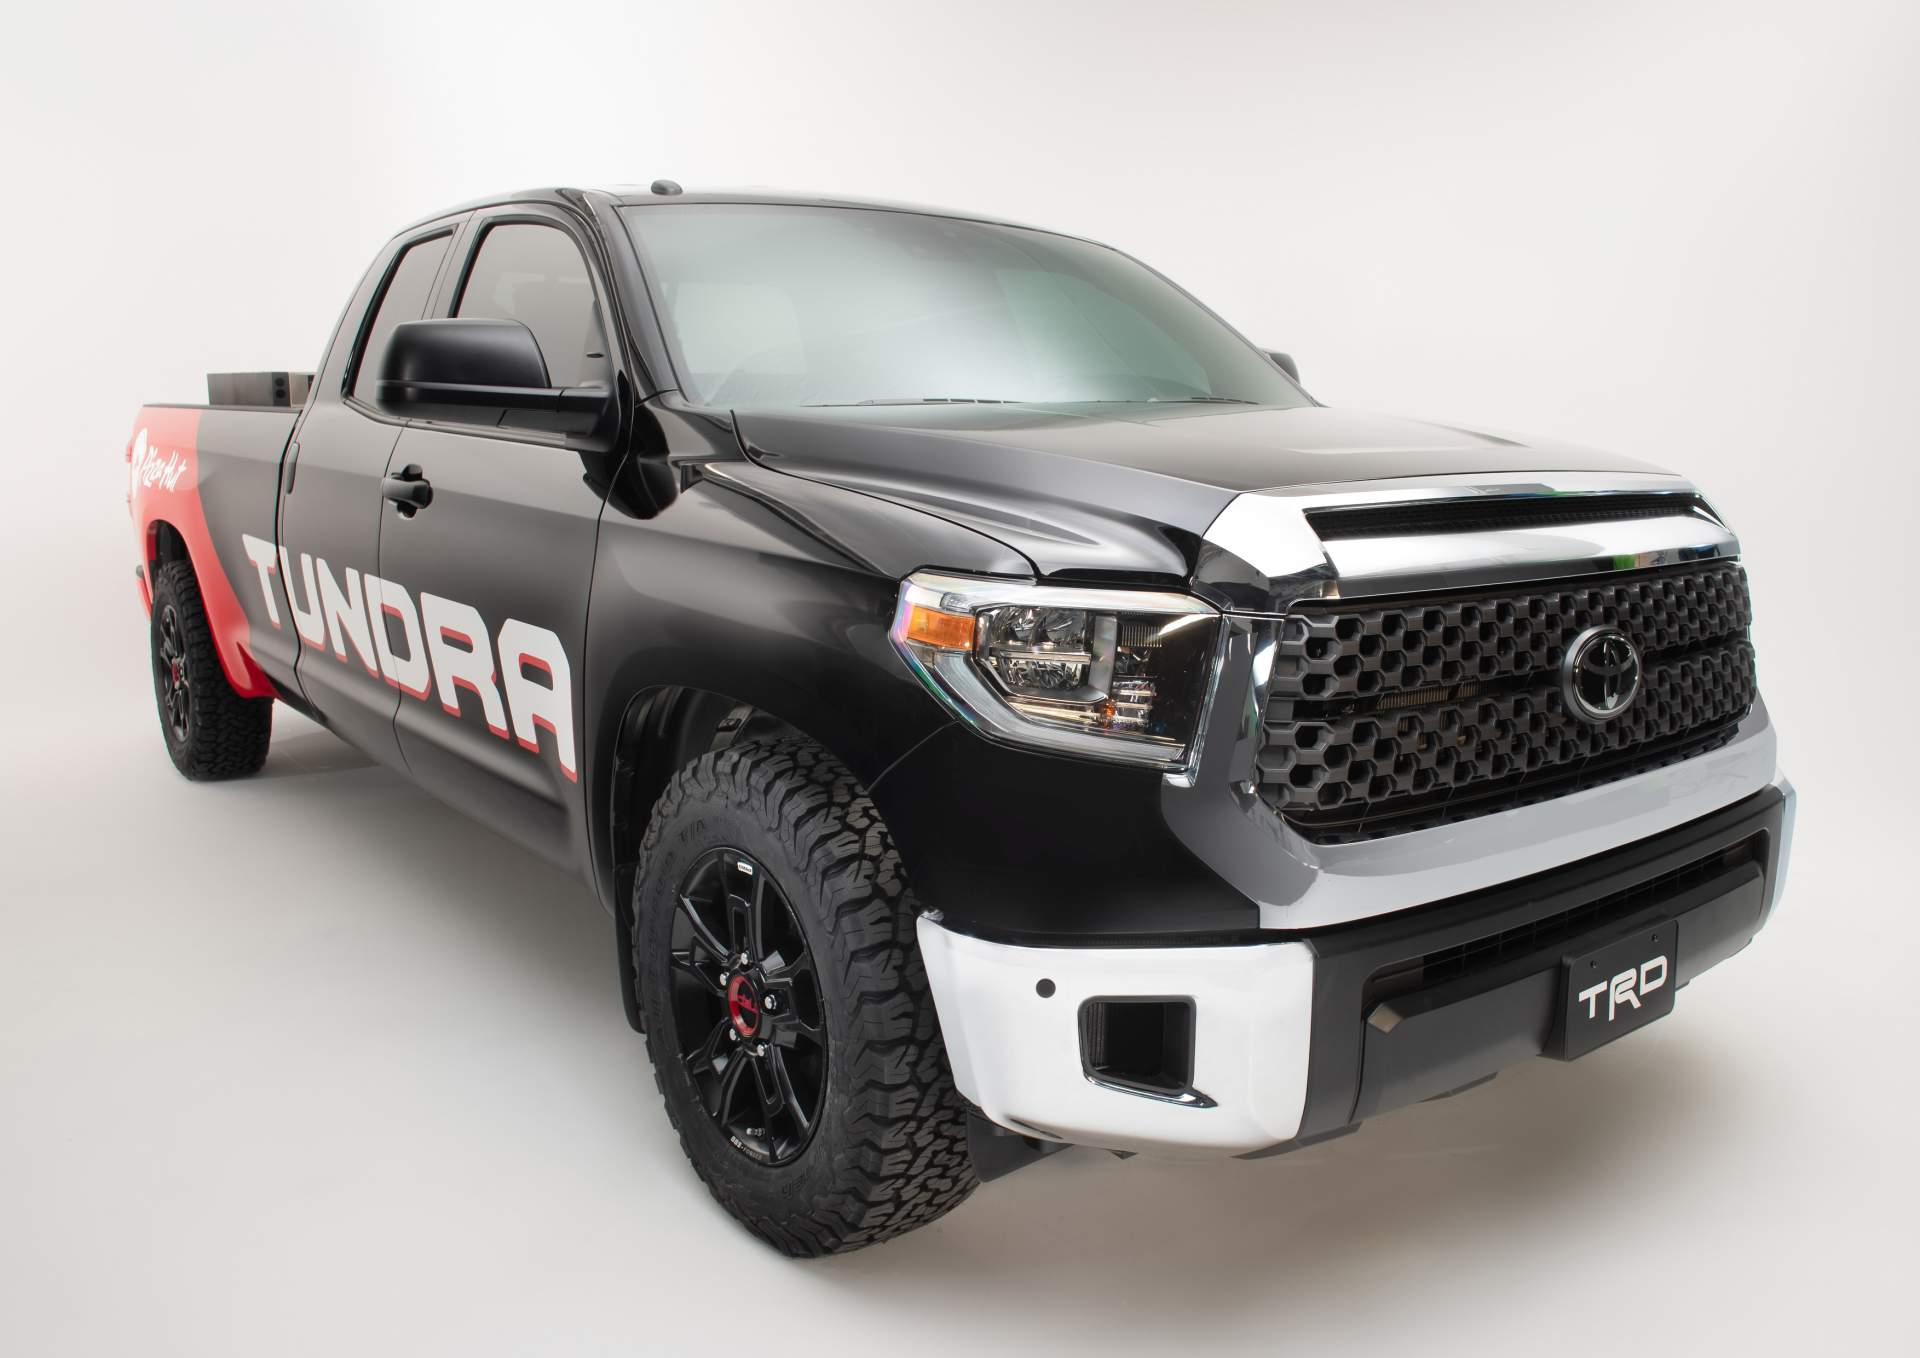 Пикап Toyota Tundra превратили в пиццерию на колесах